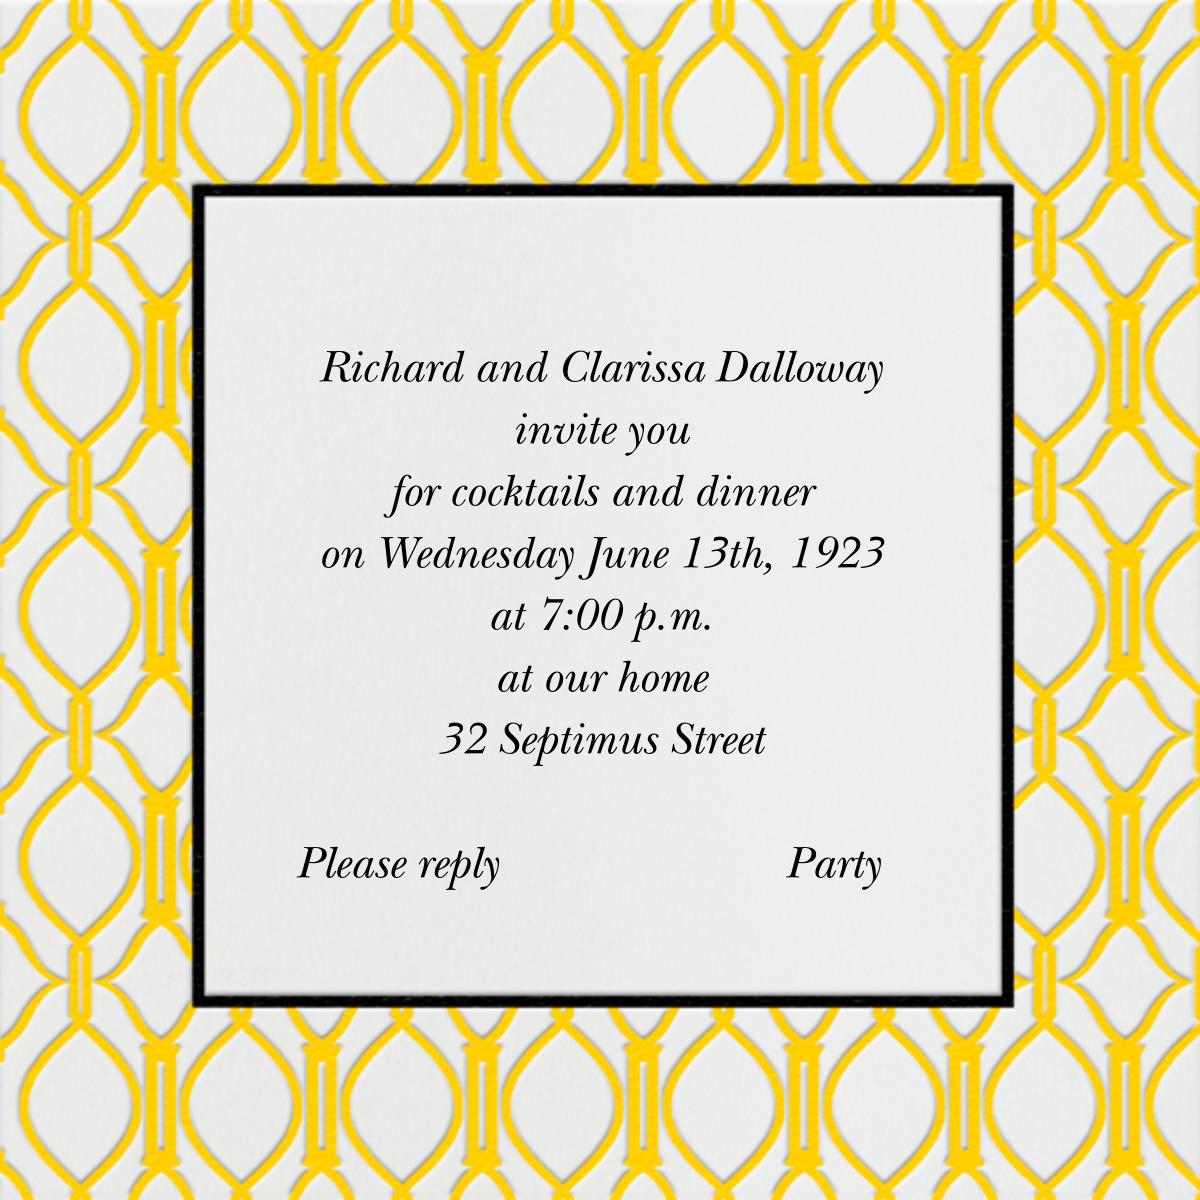 Cadogan Yellow Square - Paperless Post - General entertaining